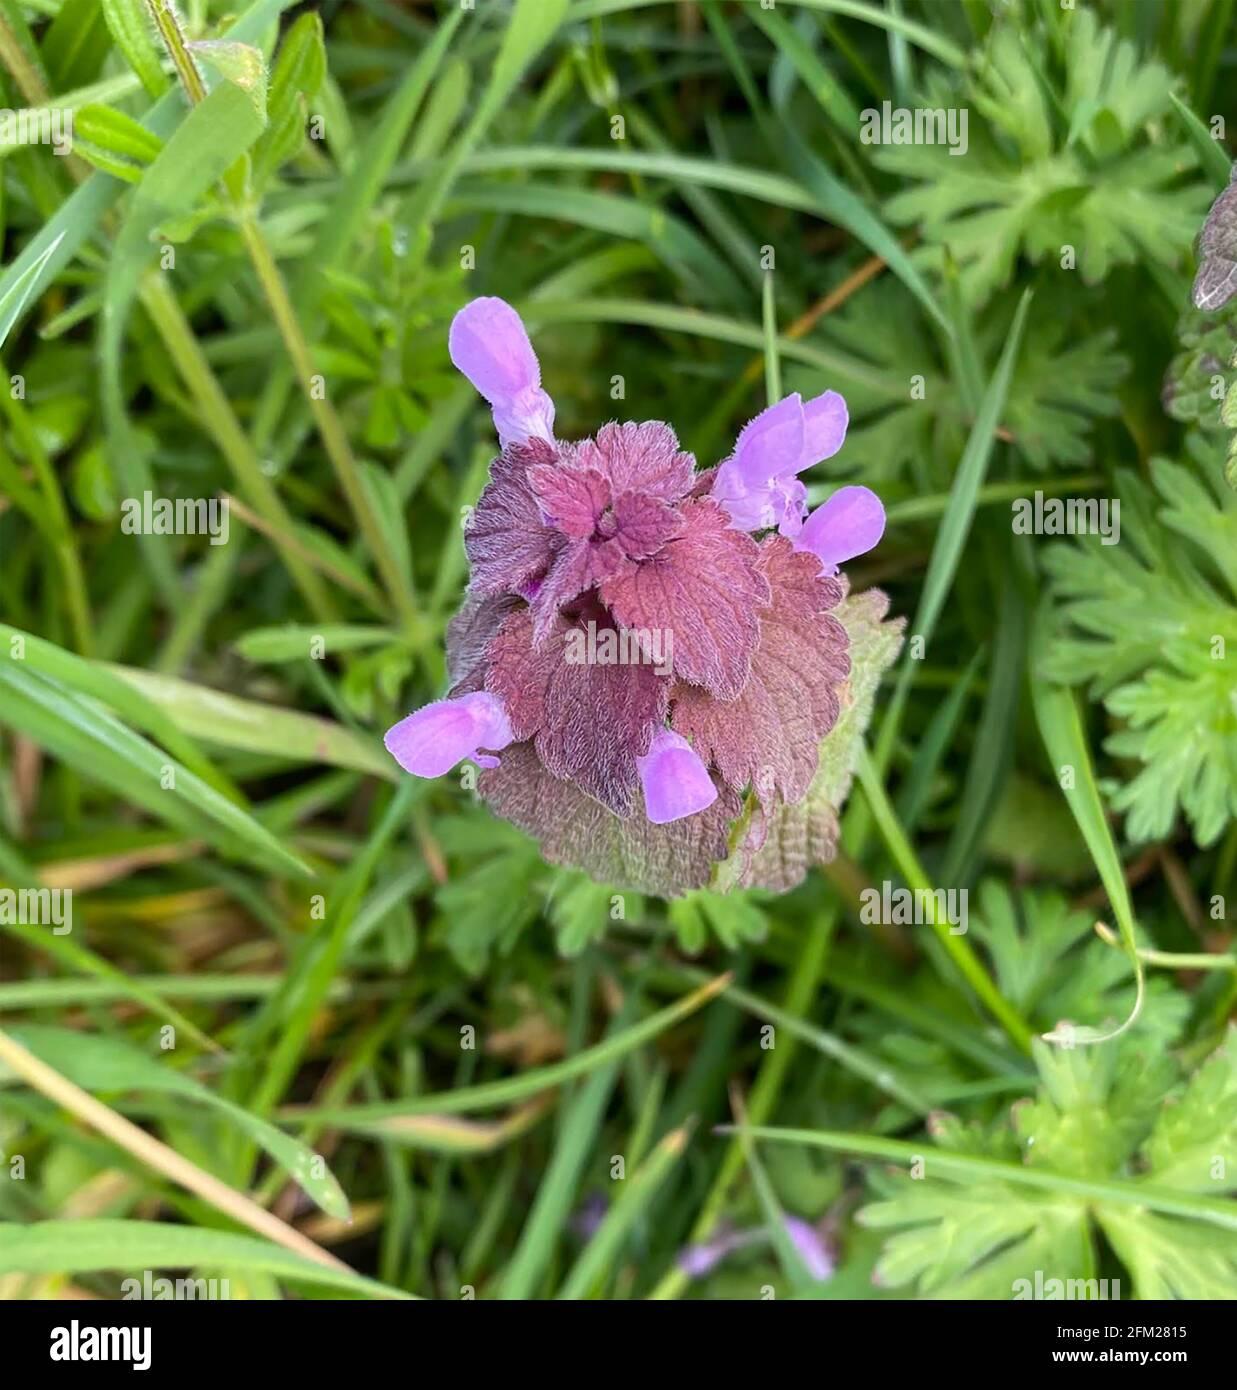 ROTE TOTNESSEL Lamium pureum einjährige krautige Pflanze. Foto: Tony Gale Stockfoto